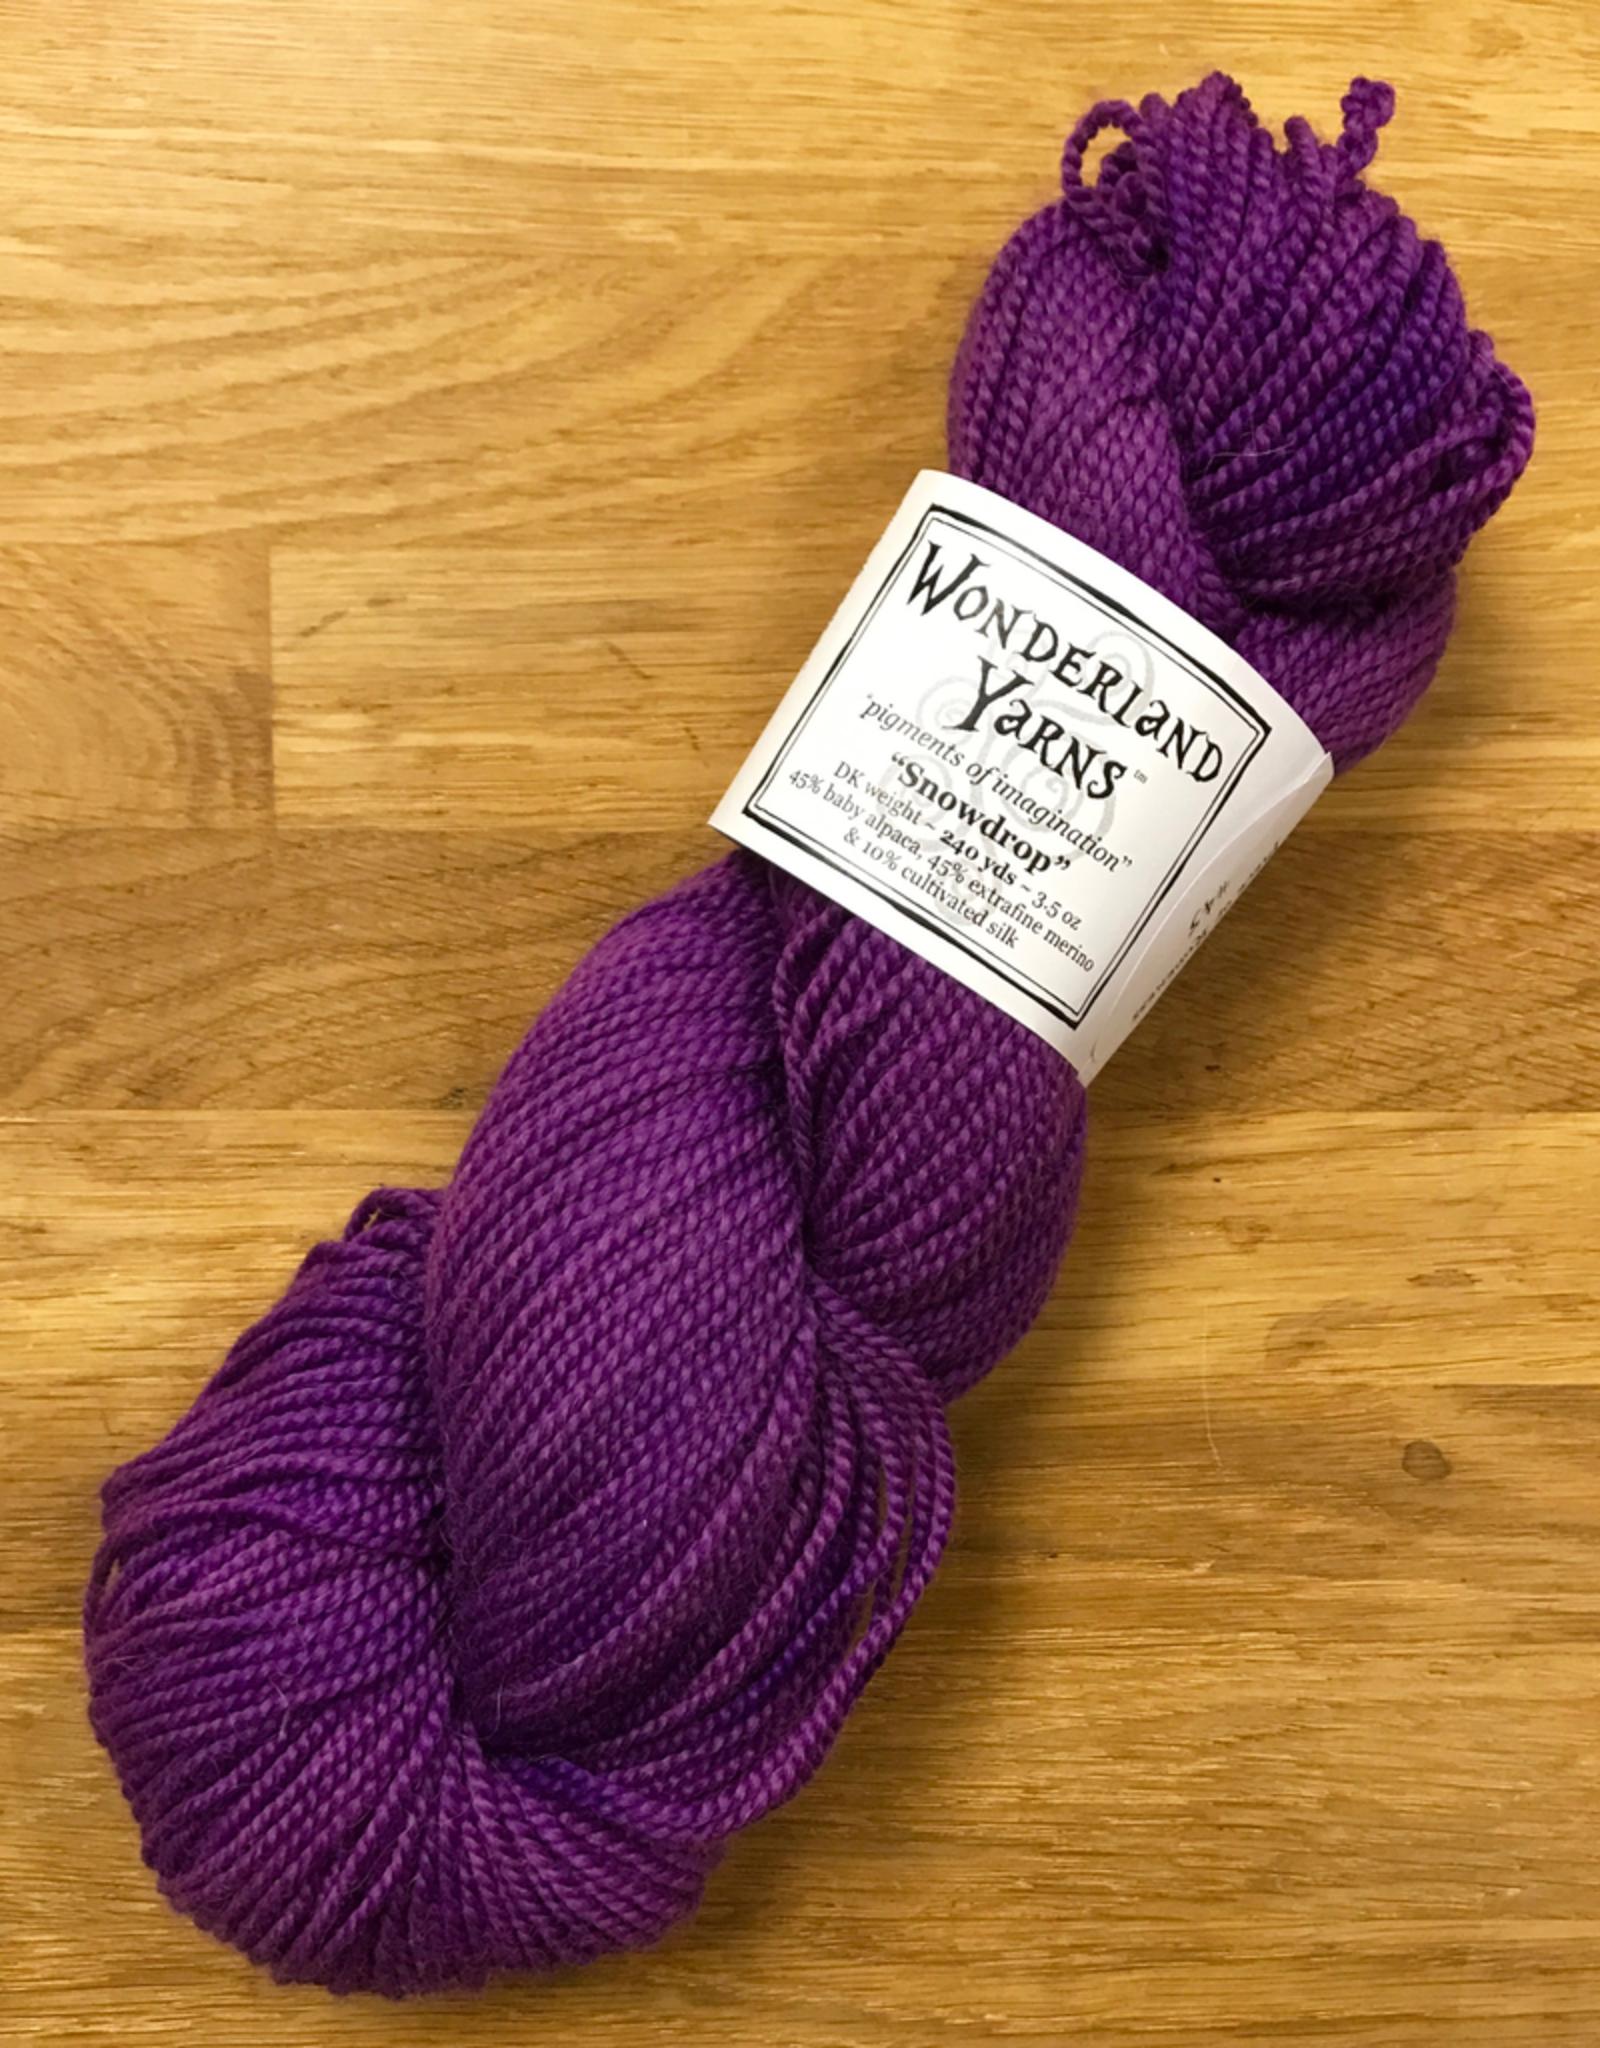 Wonderland Yarn Snowdrop by Wonderland Yarns